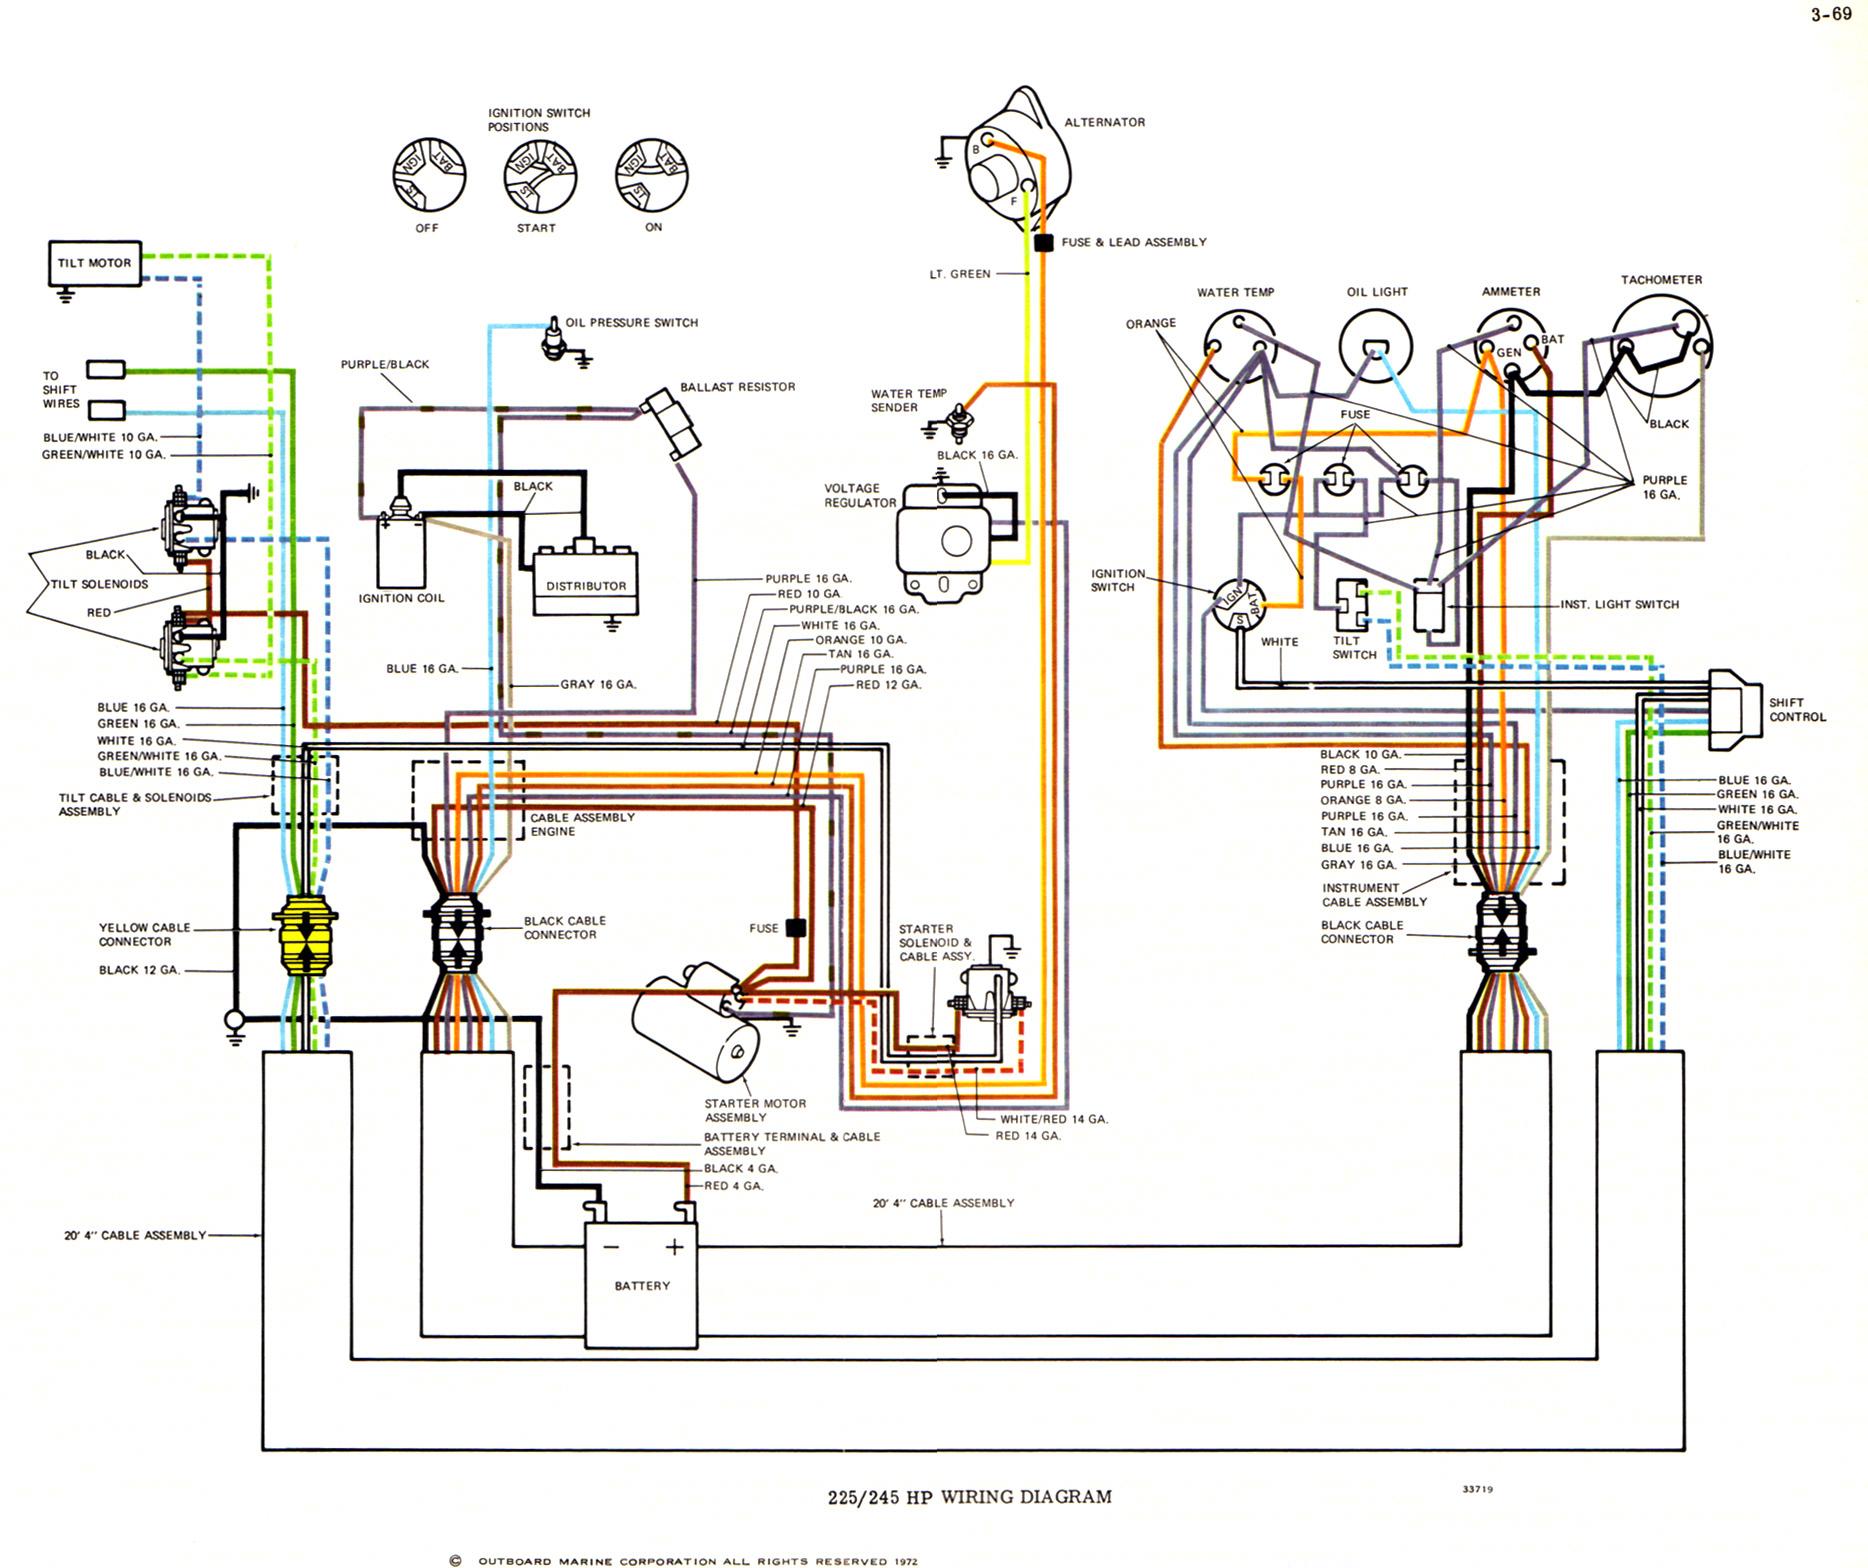 Marvelous 0583653 Omc Wiring Diagram Wiring Diagram Wiring Cloud Lukepaidewilluminateatxorg